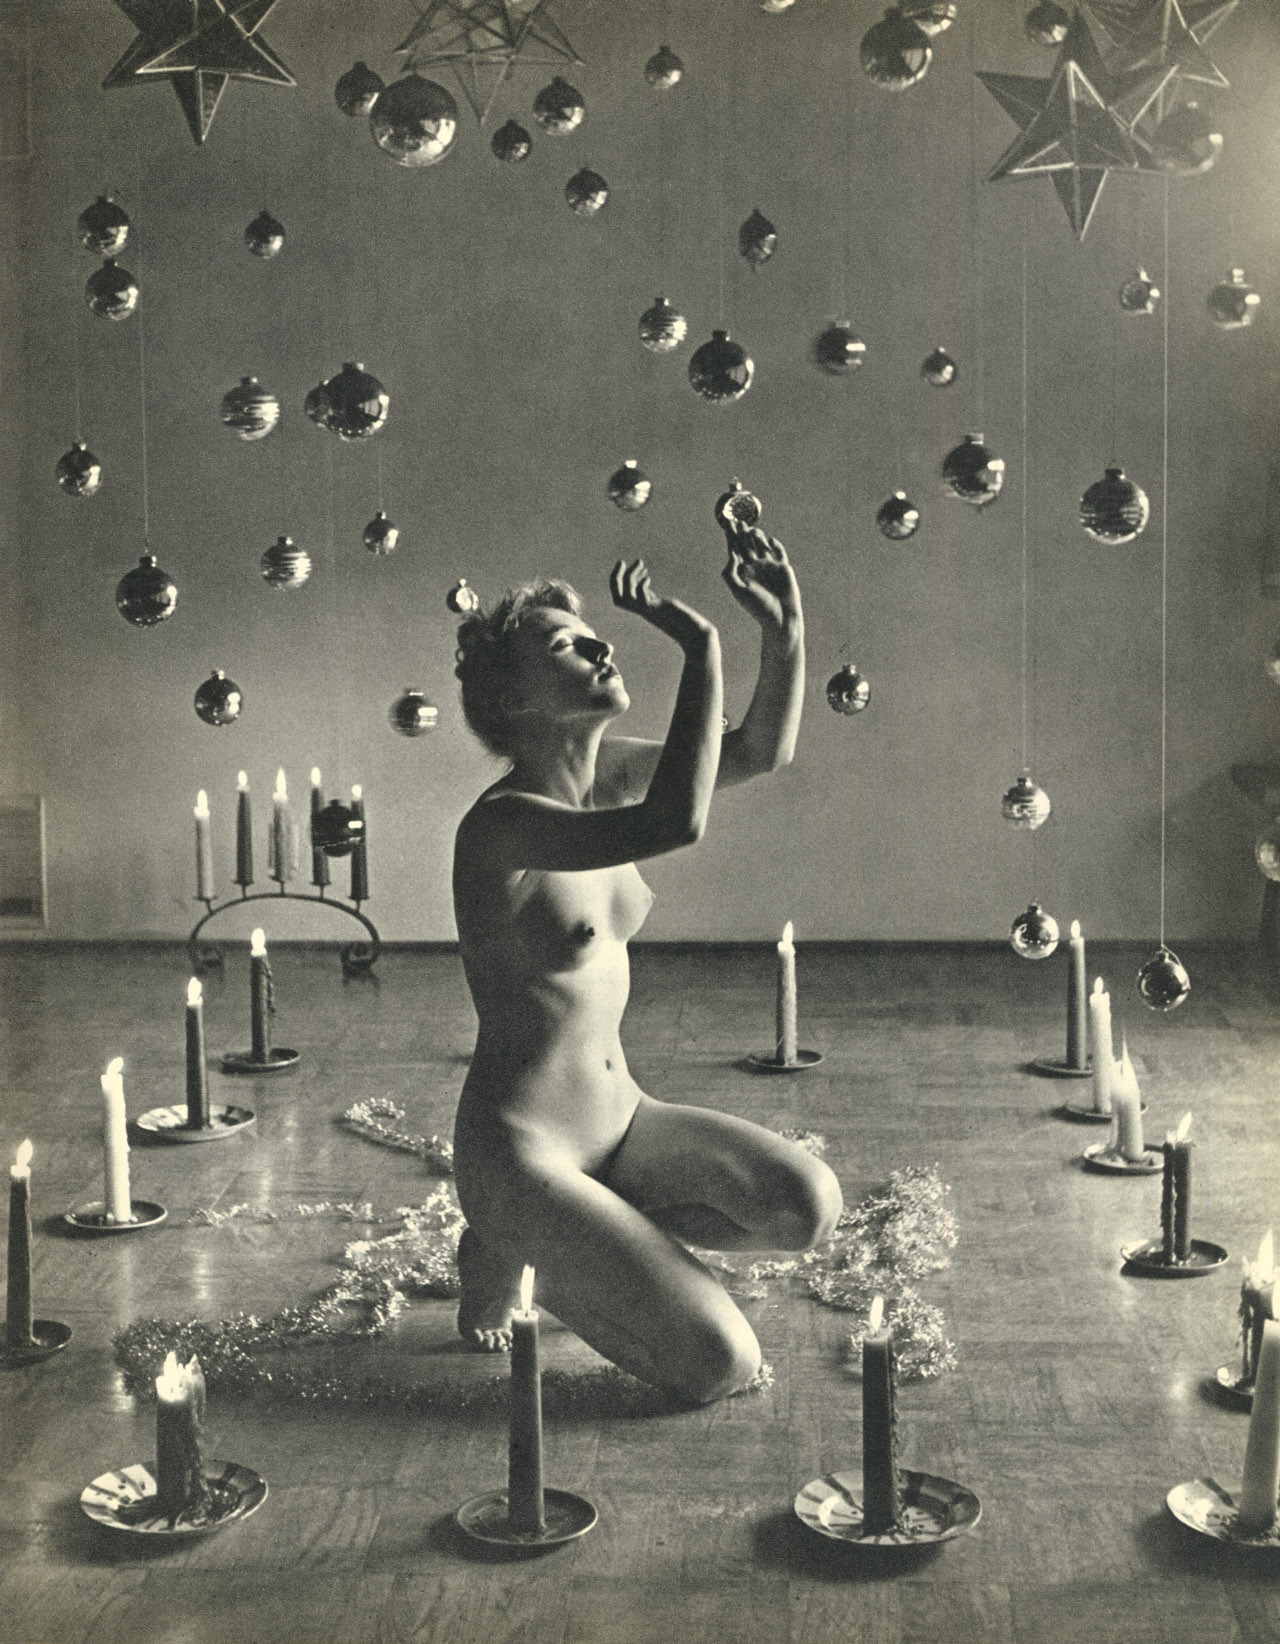 Andre_de_Dienes-night-rooms.jpg